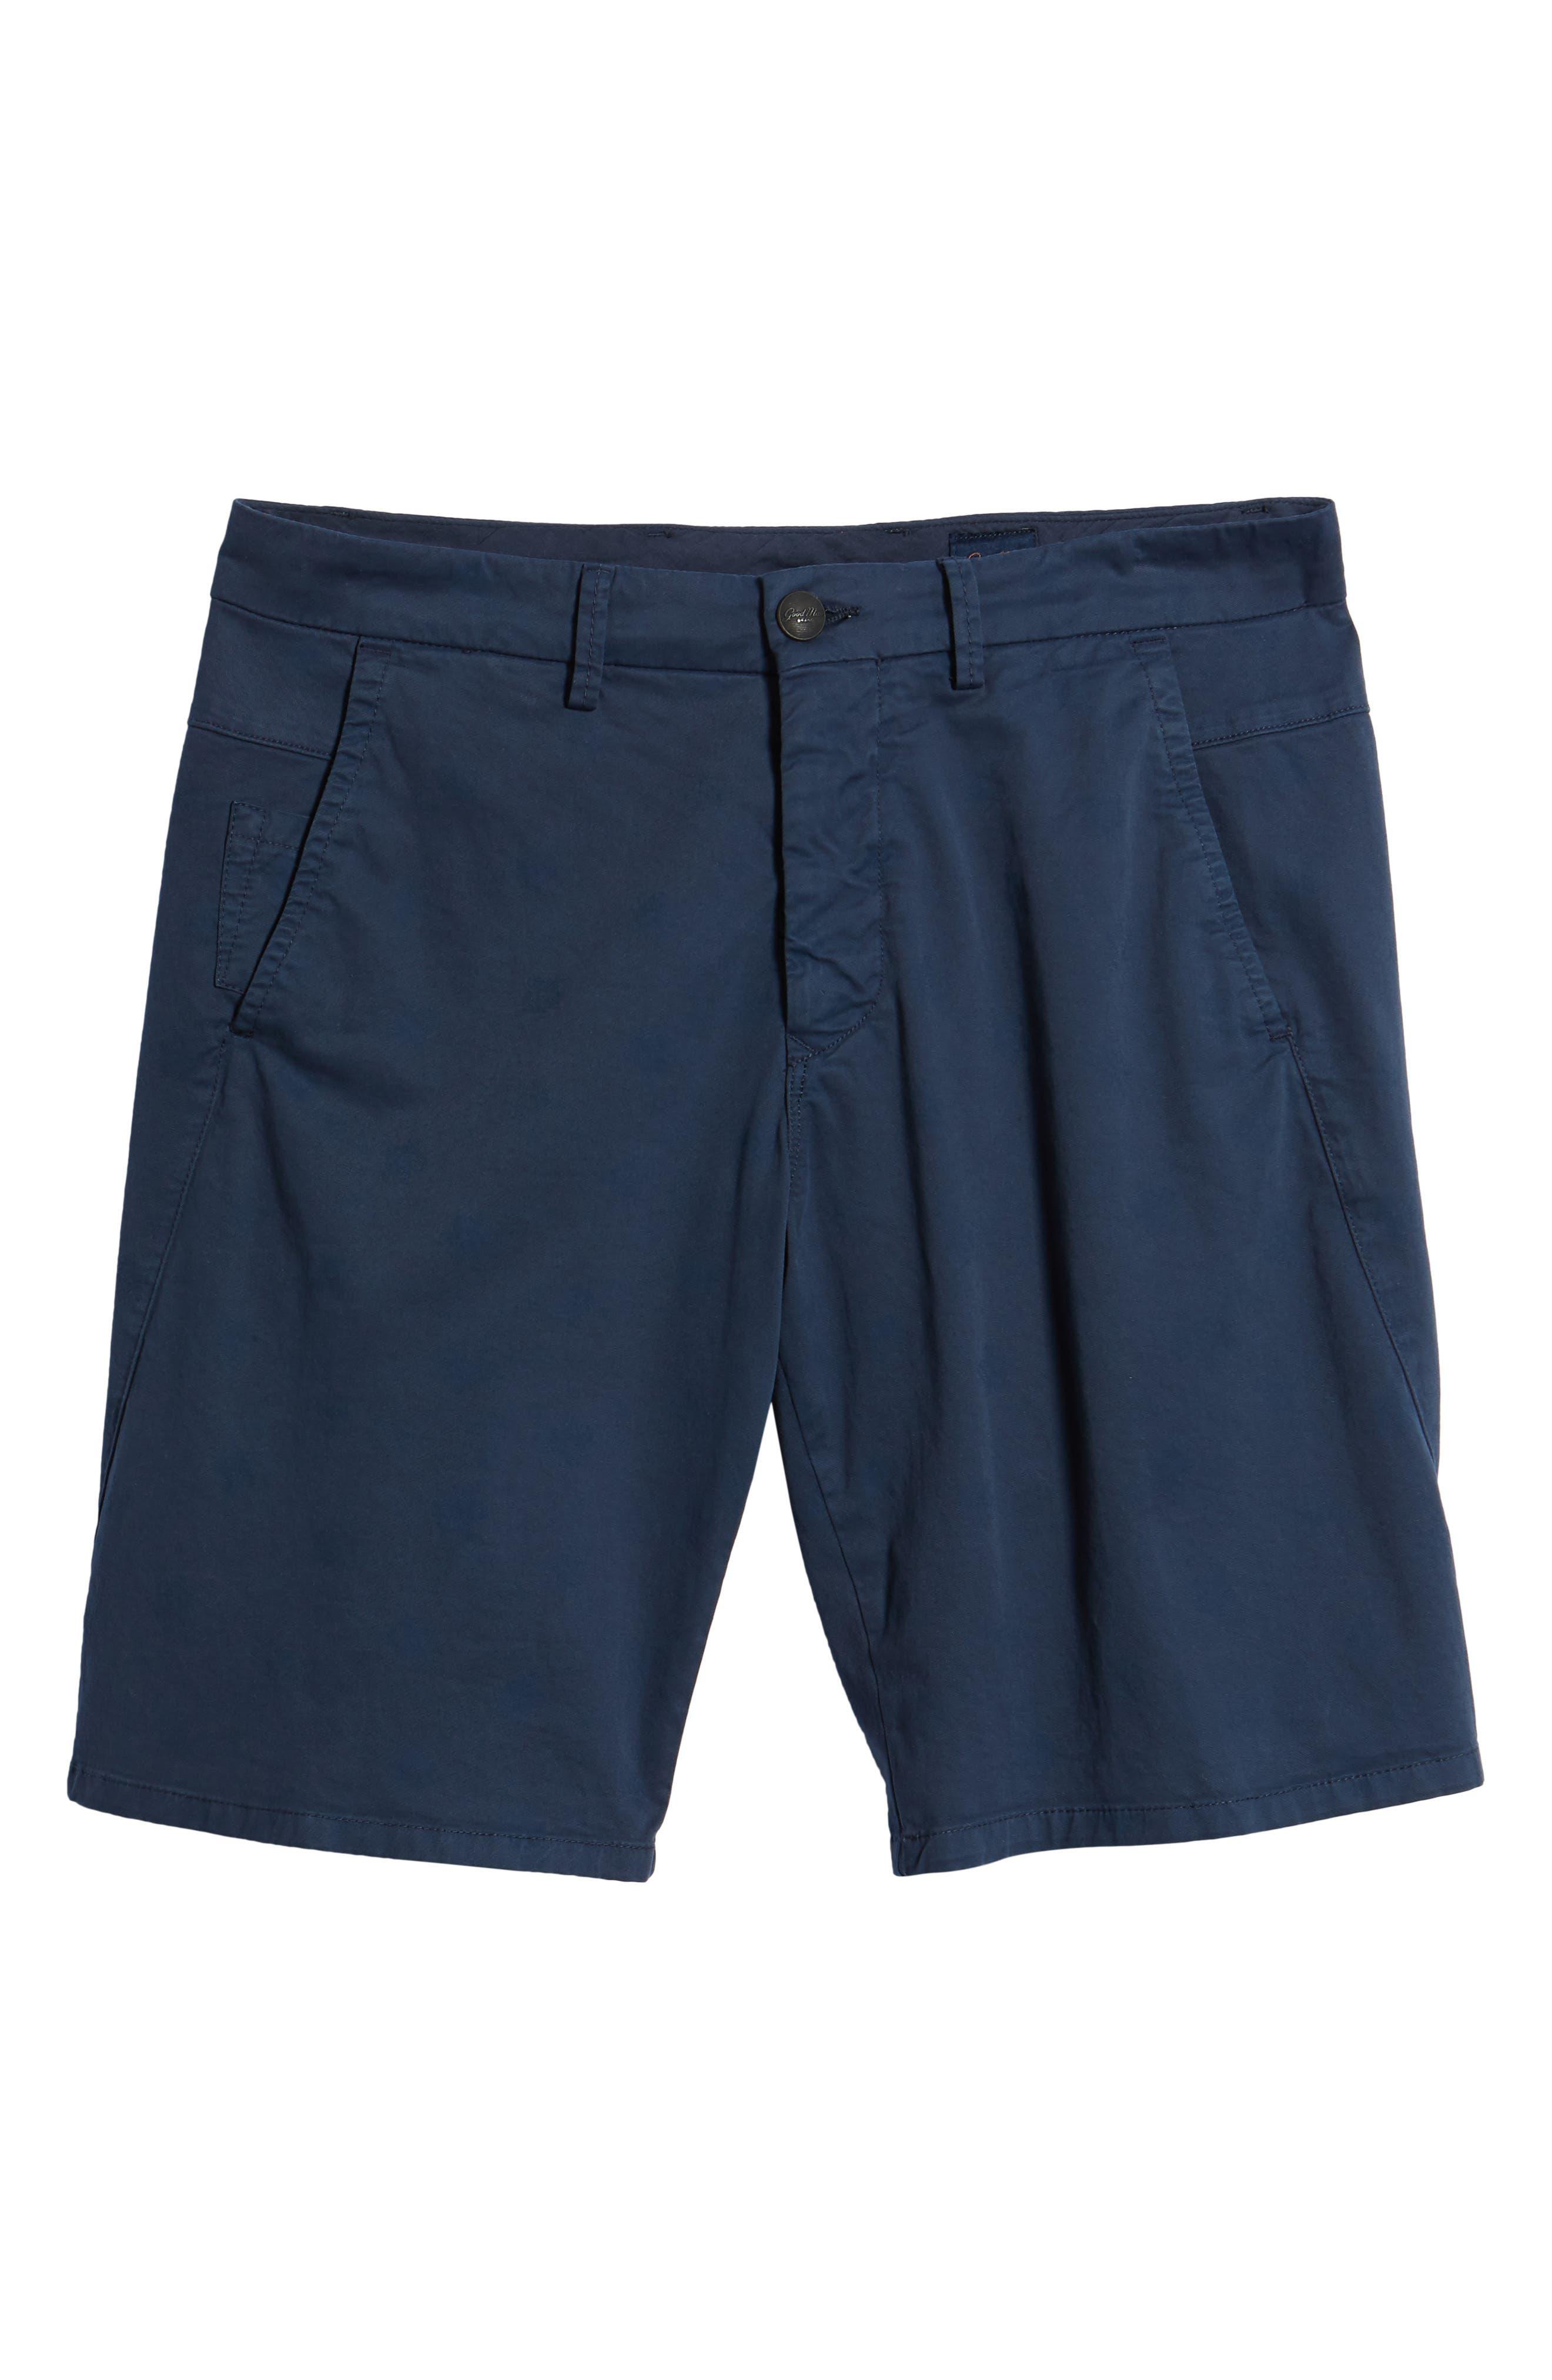 Monaco Floral Stretch Shorts,                             Main thumbnail 1, color,                             Indigo